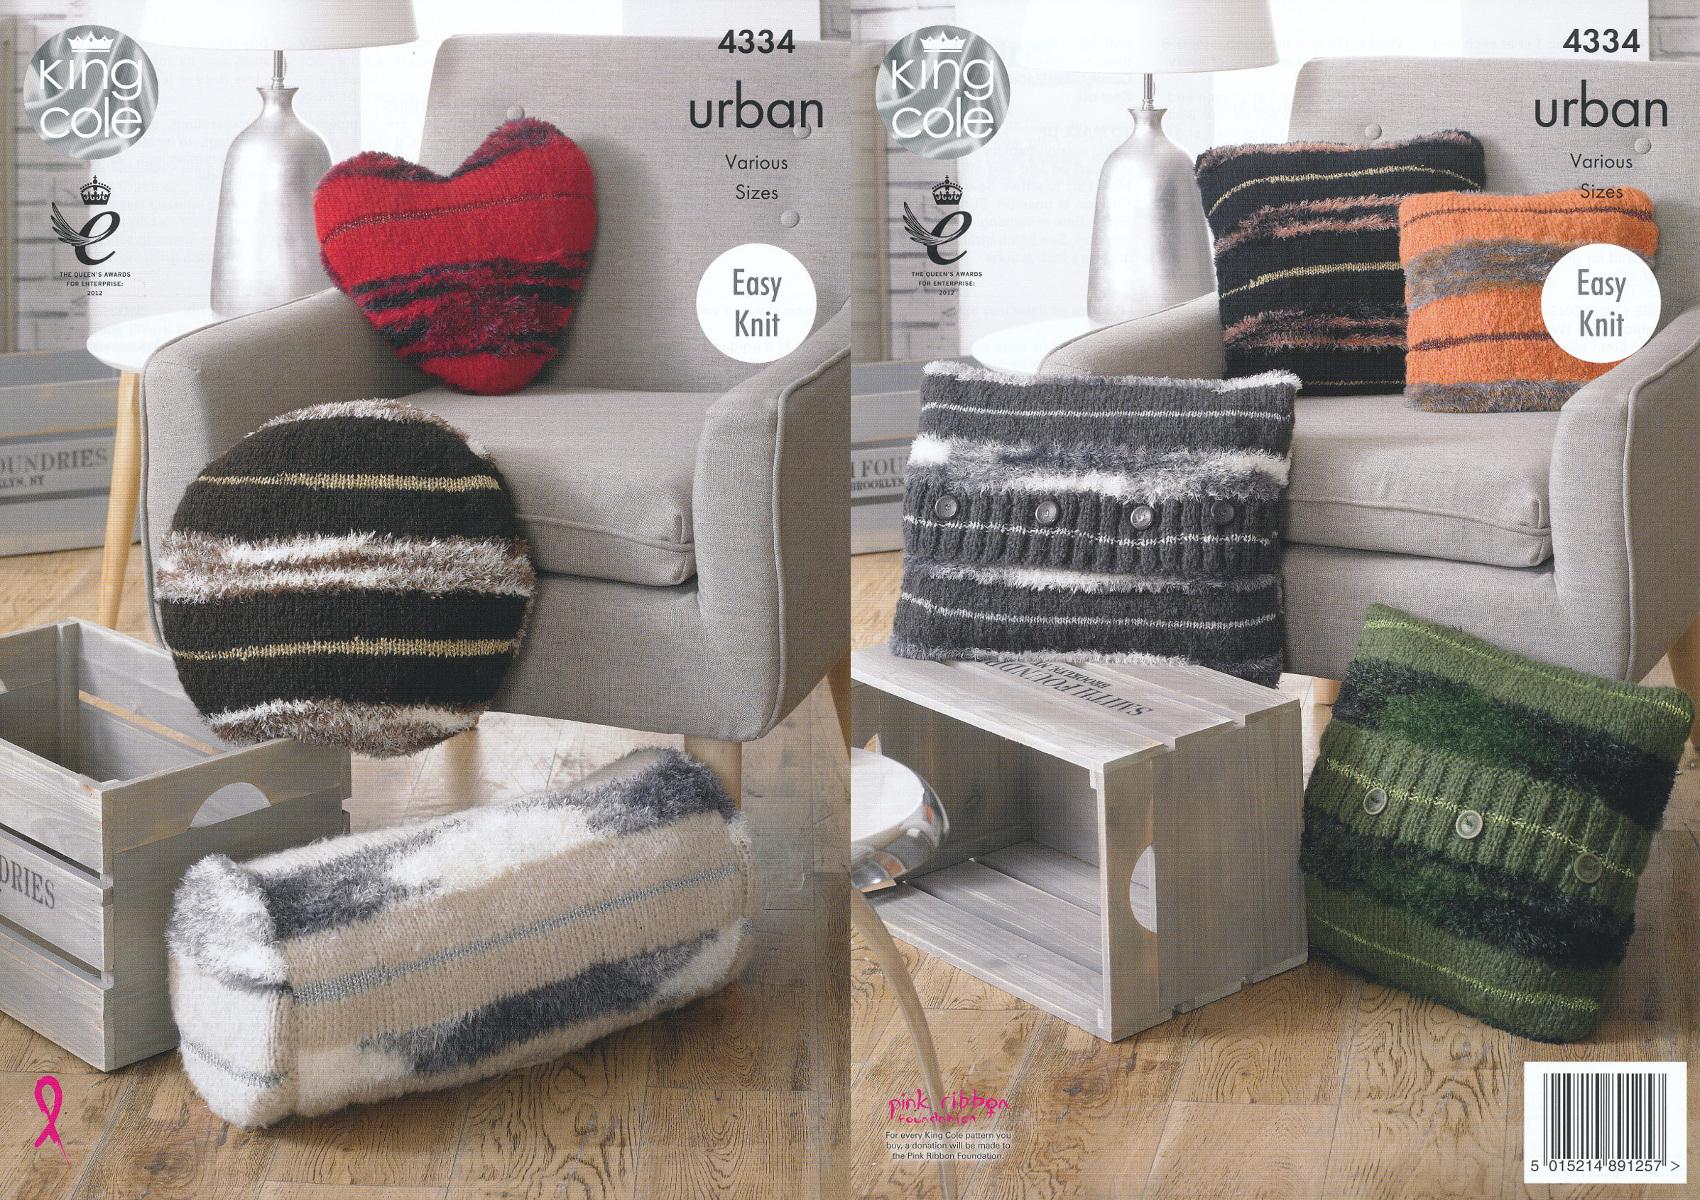 King cole urban knitting pattern cushions round square tube or king cole urban knitting pattern cushions round square tube or heart shaped 4334 bankloansurffo Gallery